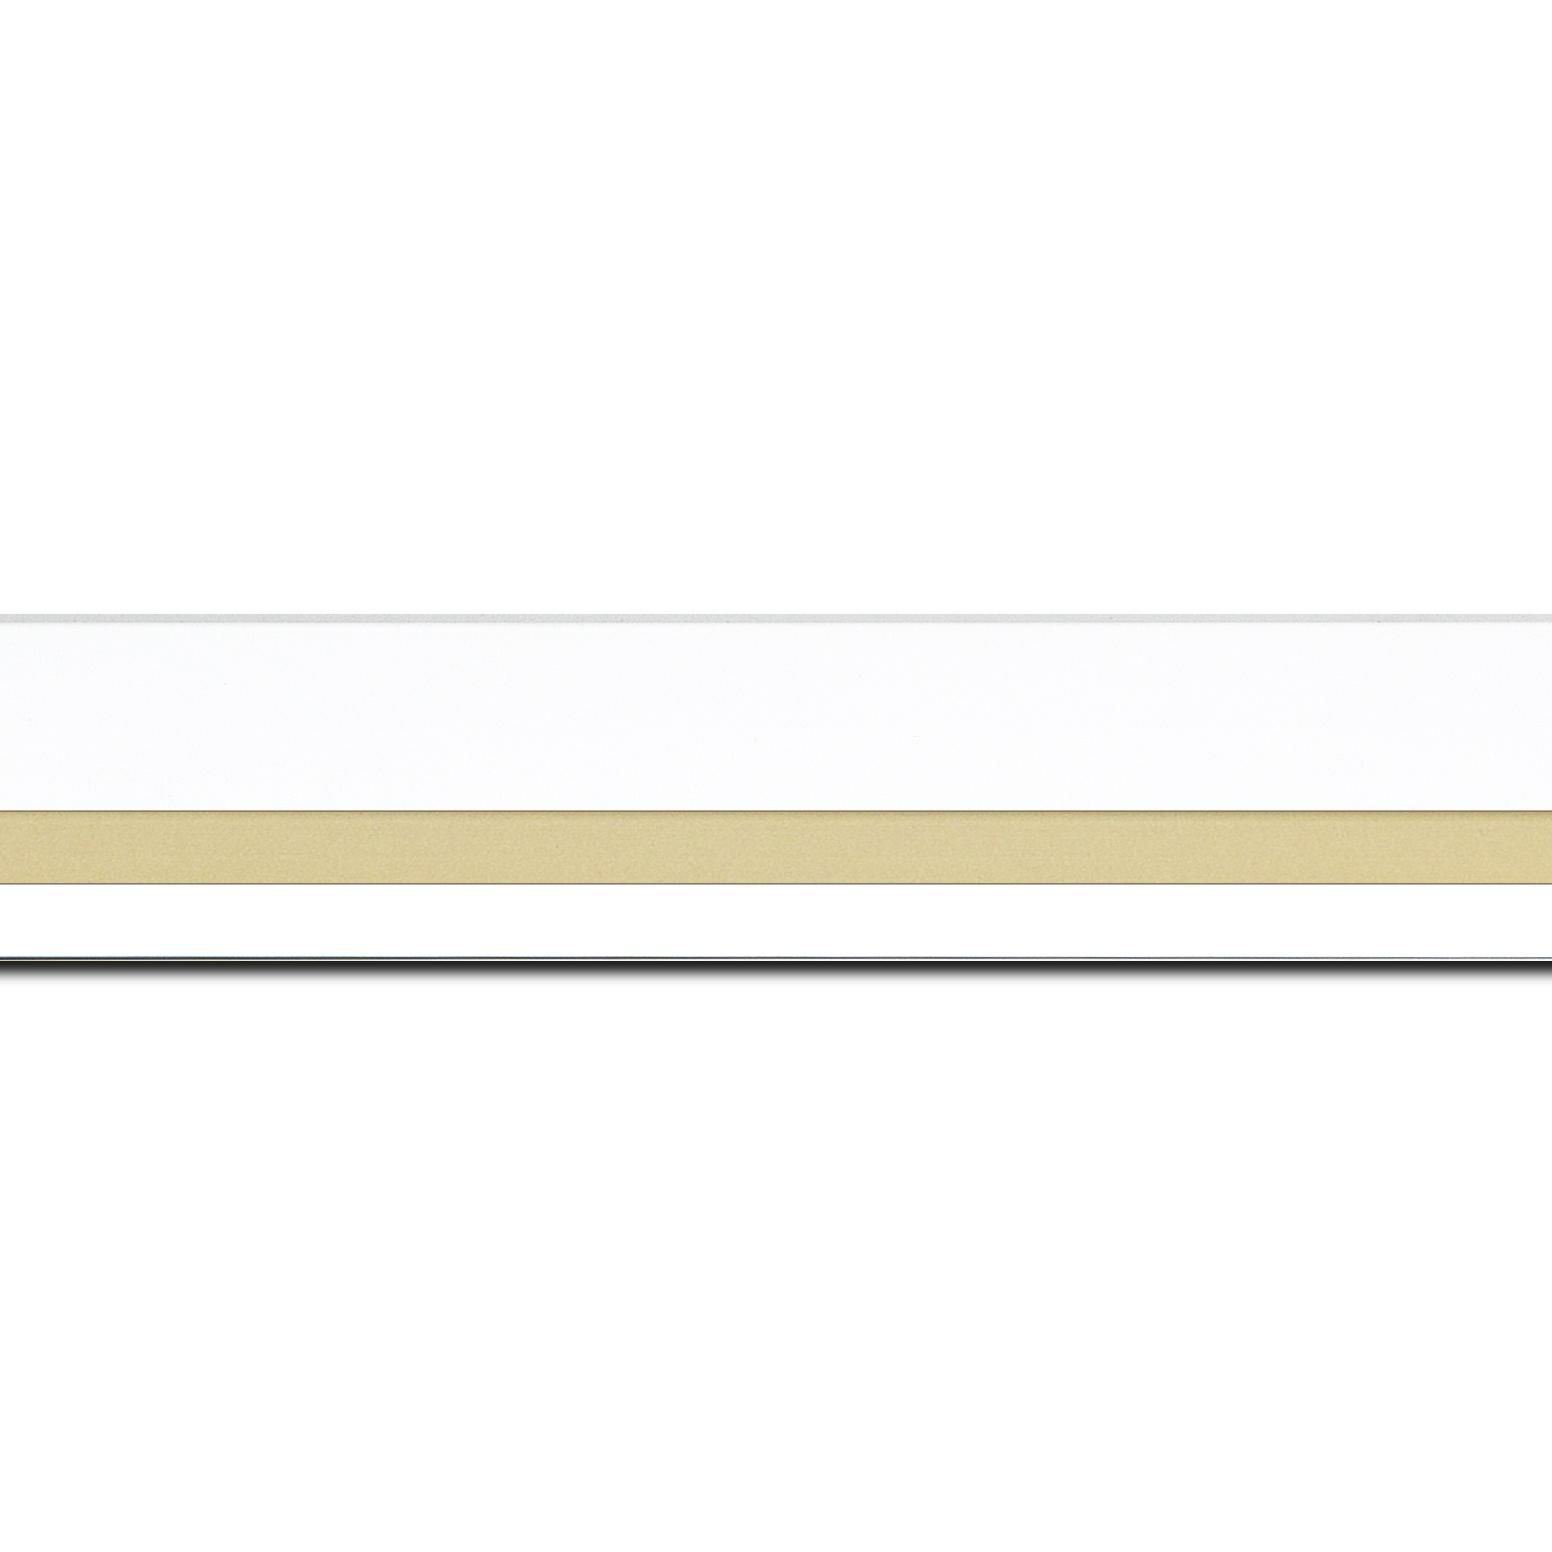 Cadre bois or blanc — 50 x 75